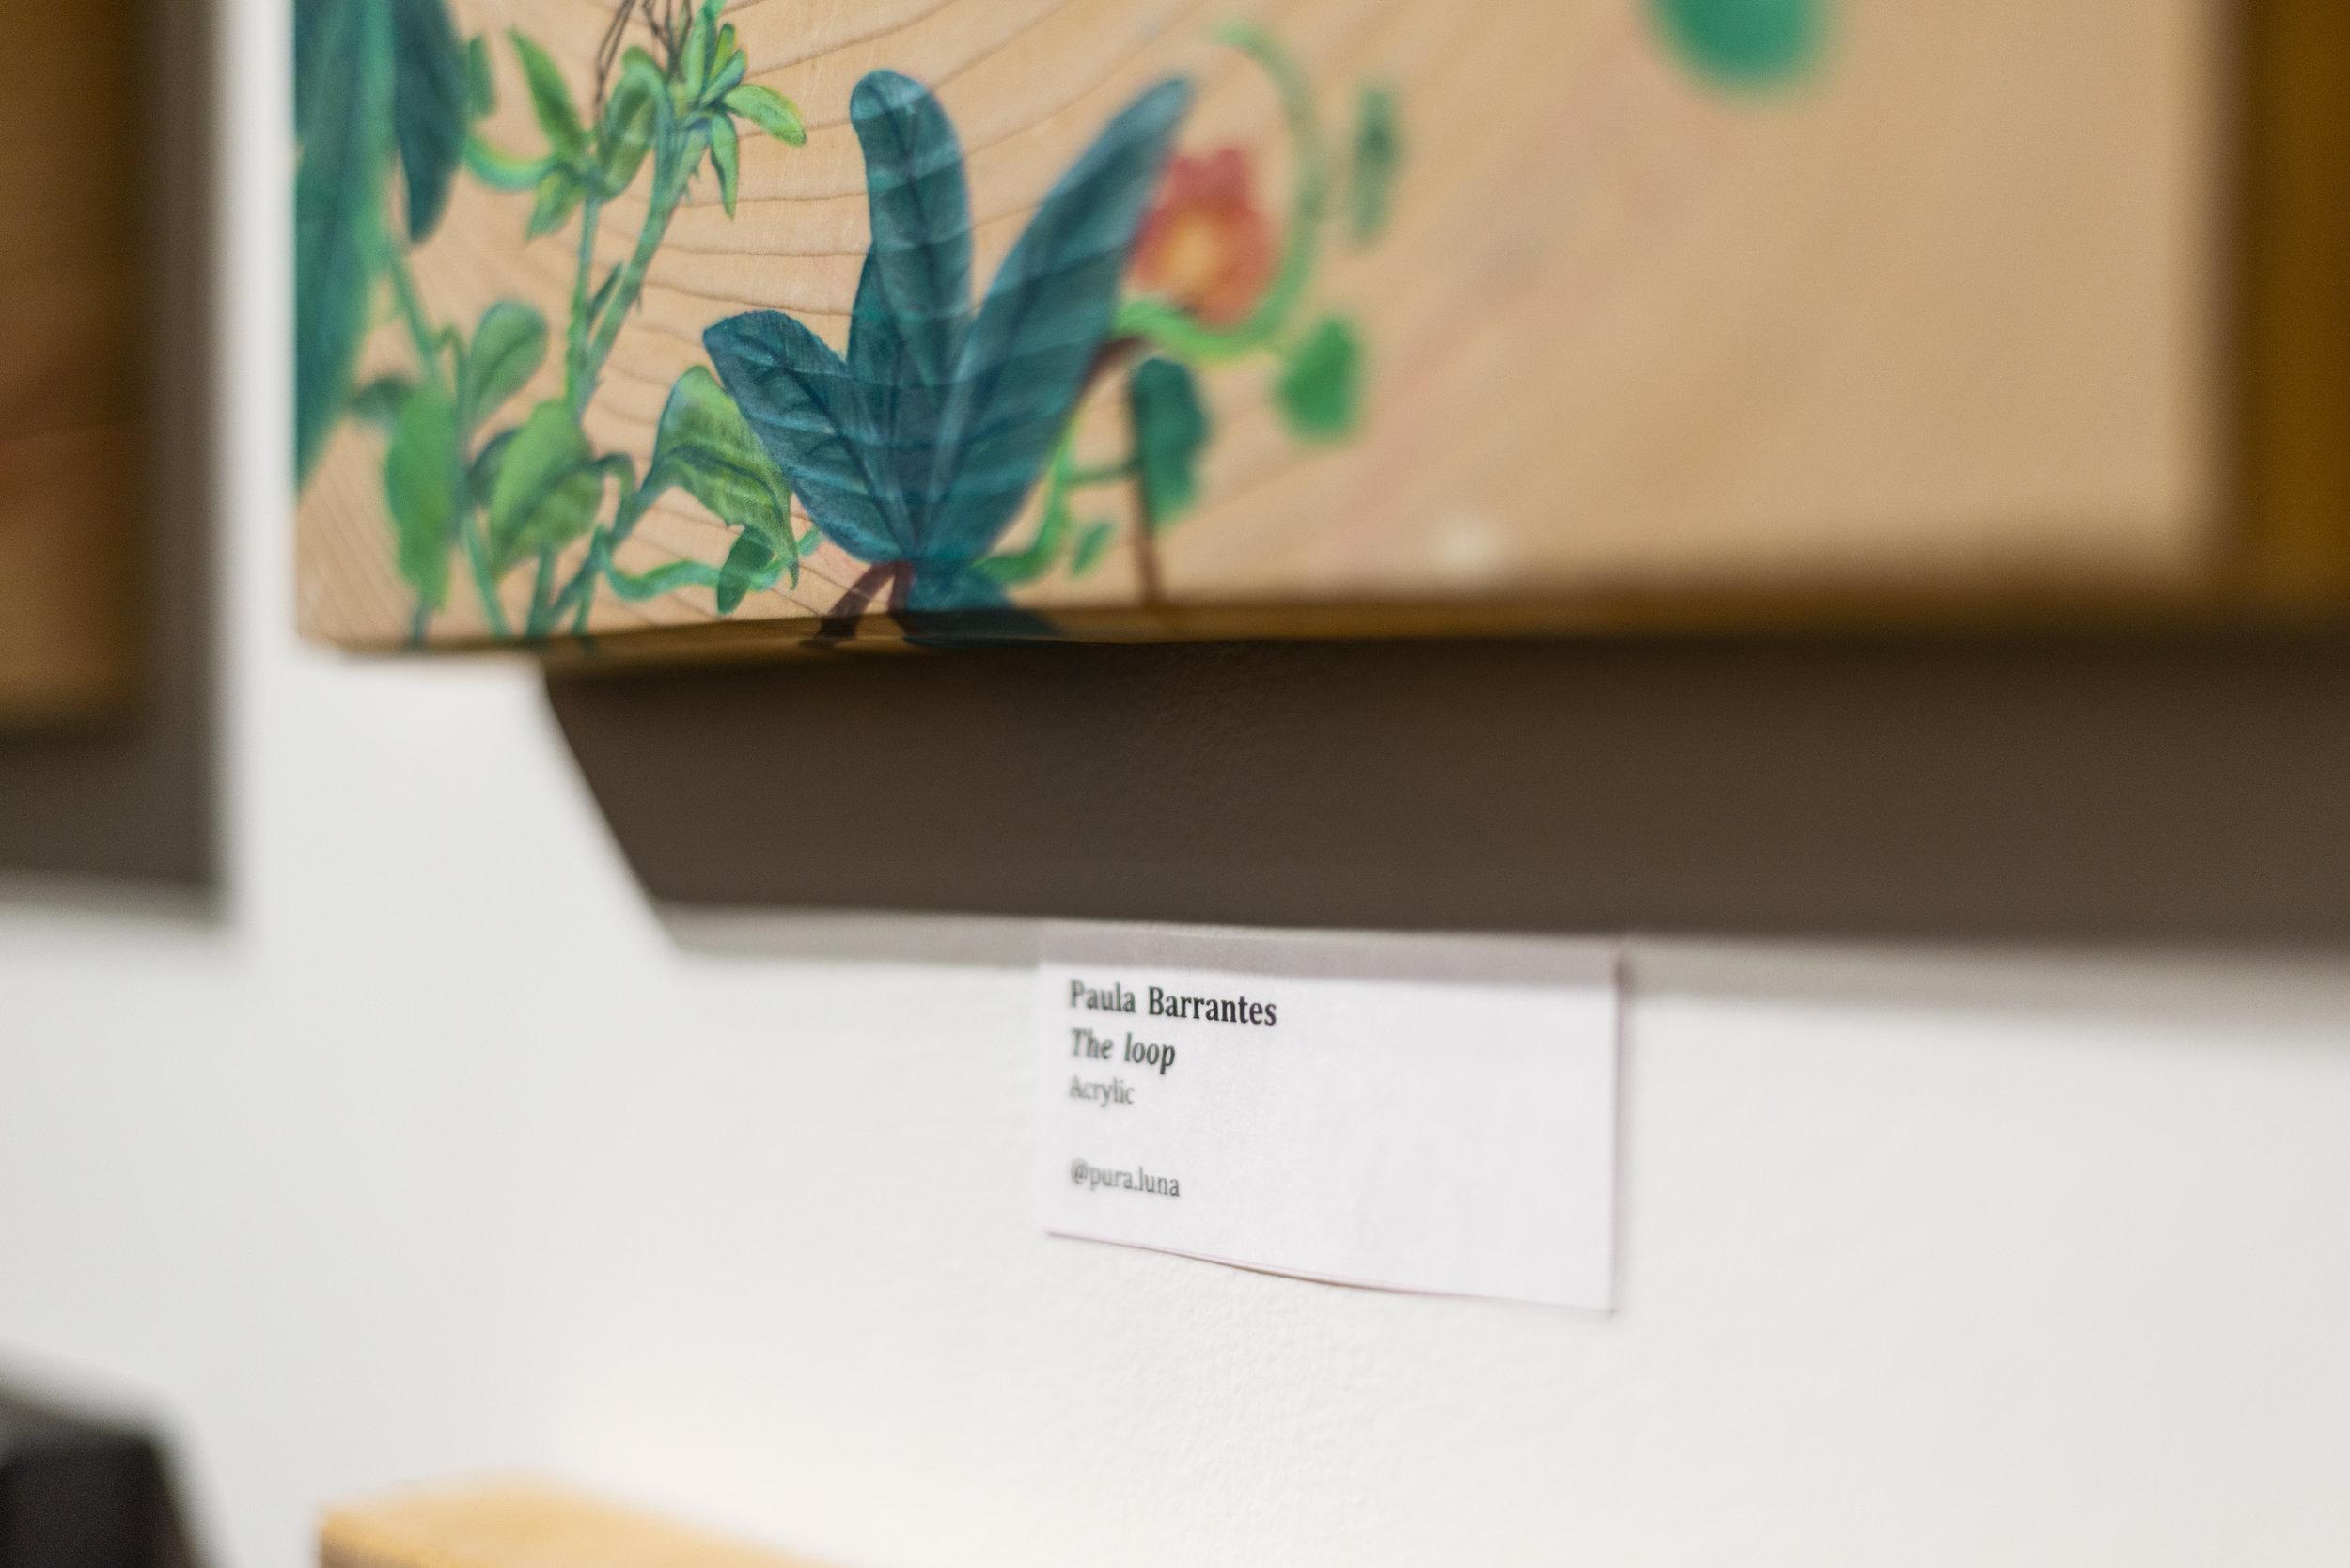 The Loop Painting - Paula Barrantes